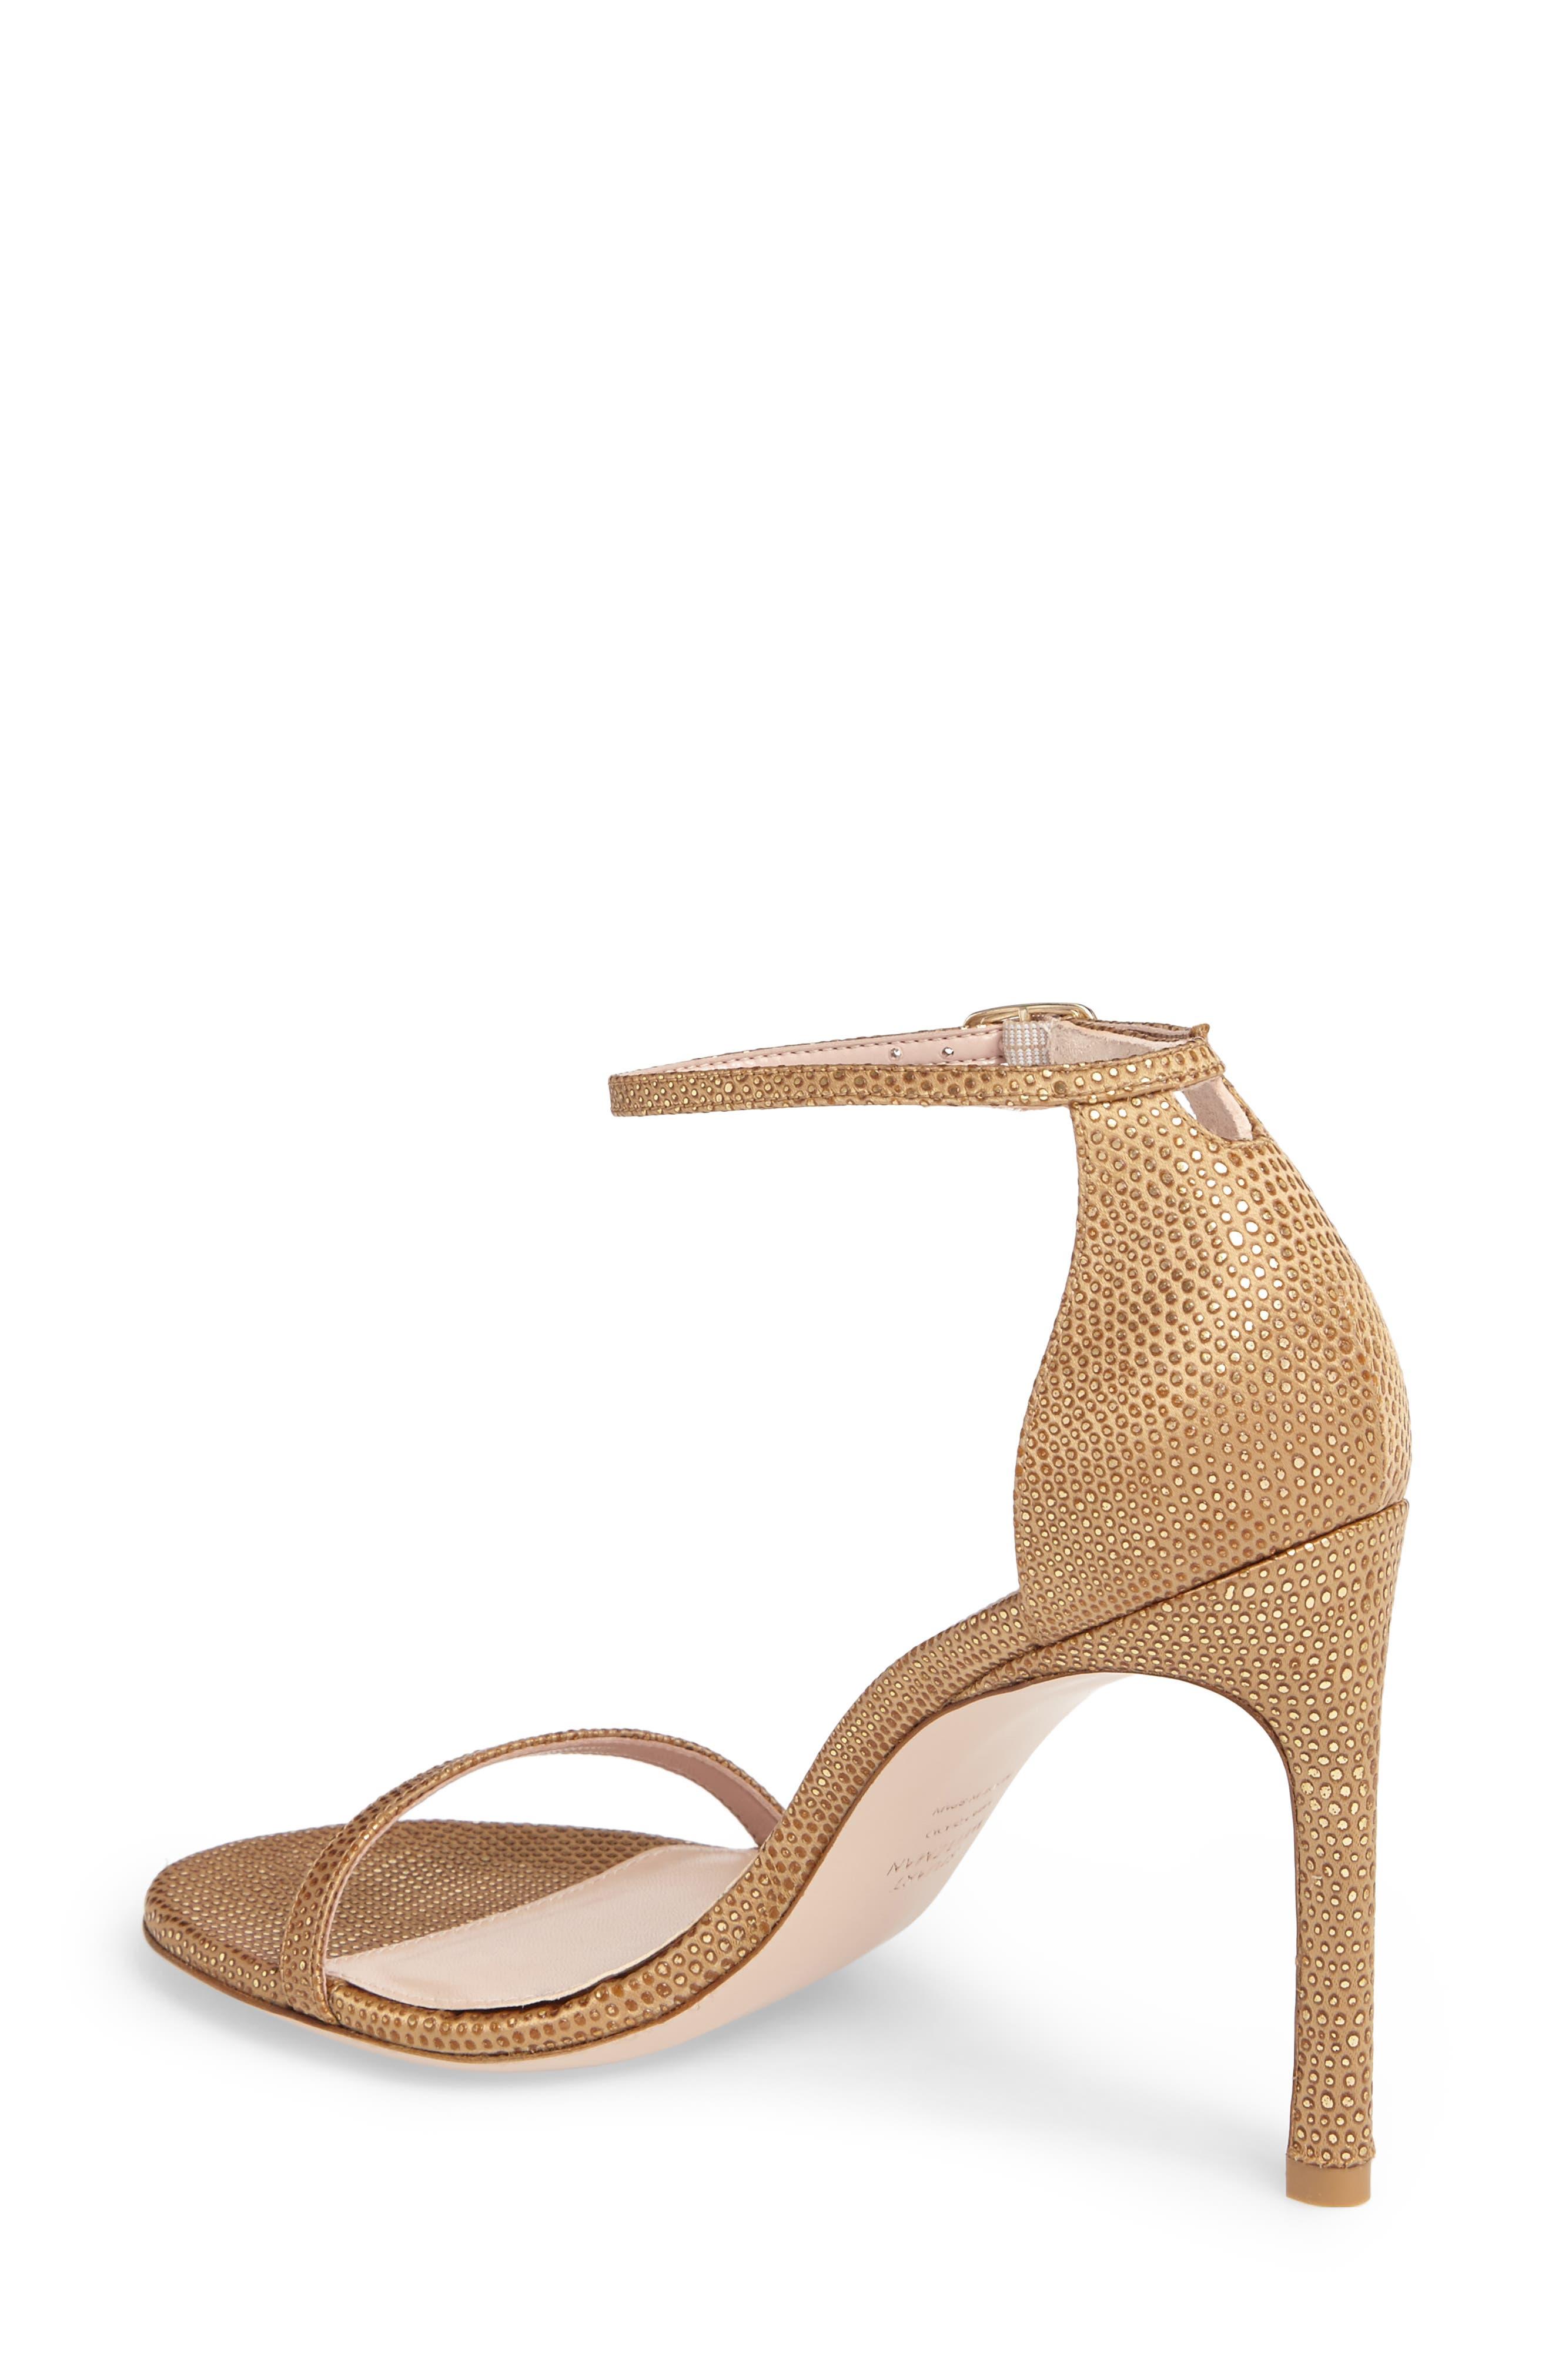 Nudistsong Ankle Strap Sandal,                             Alternate thumbnail 2, color,                             Gold Dot